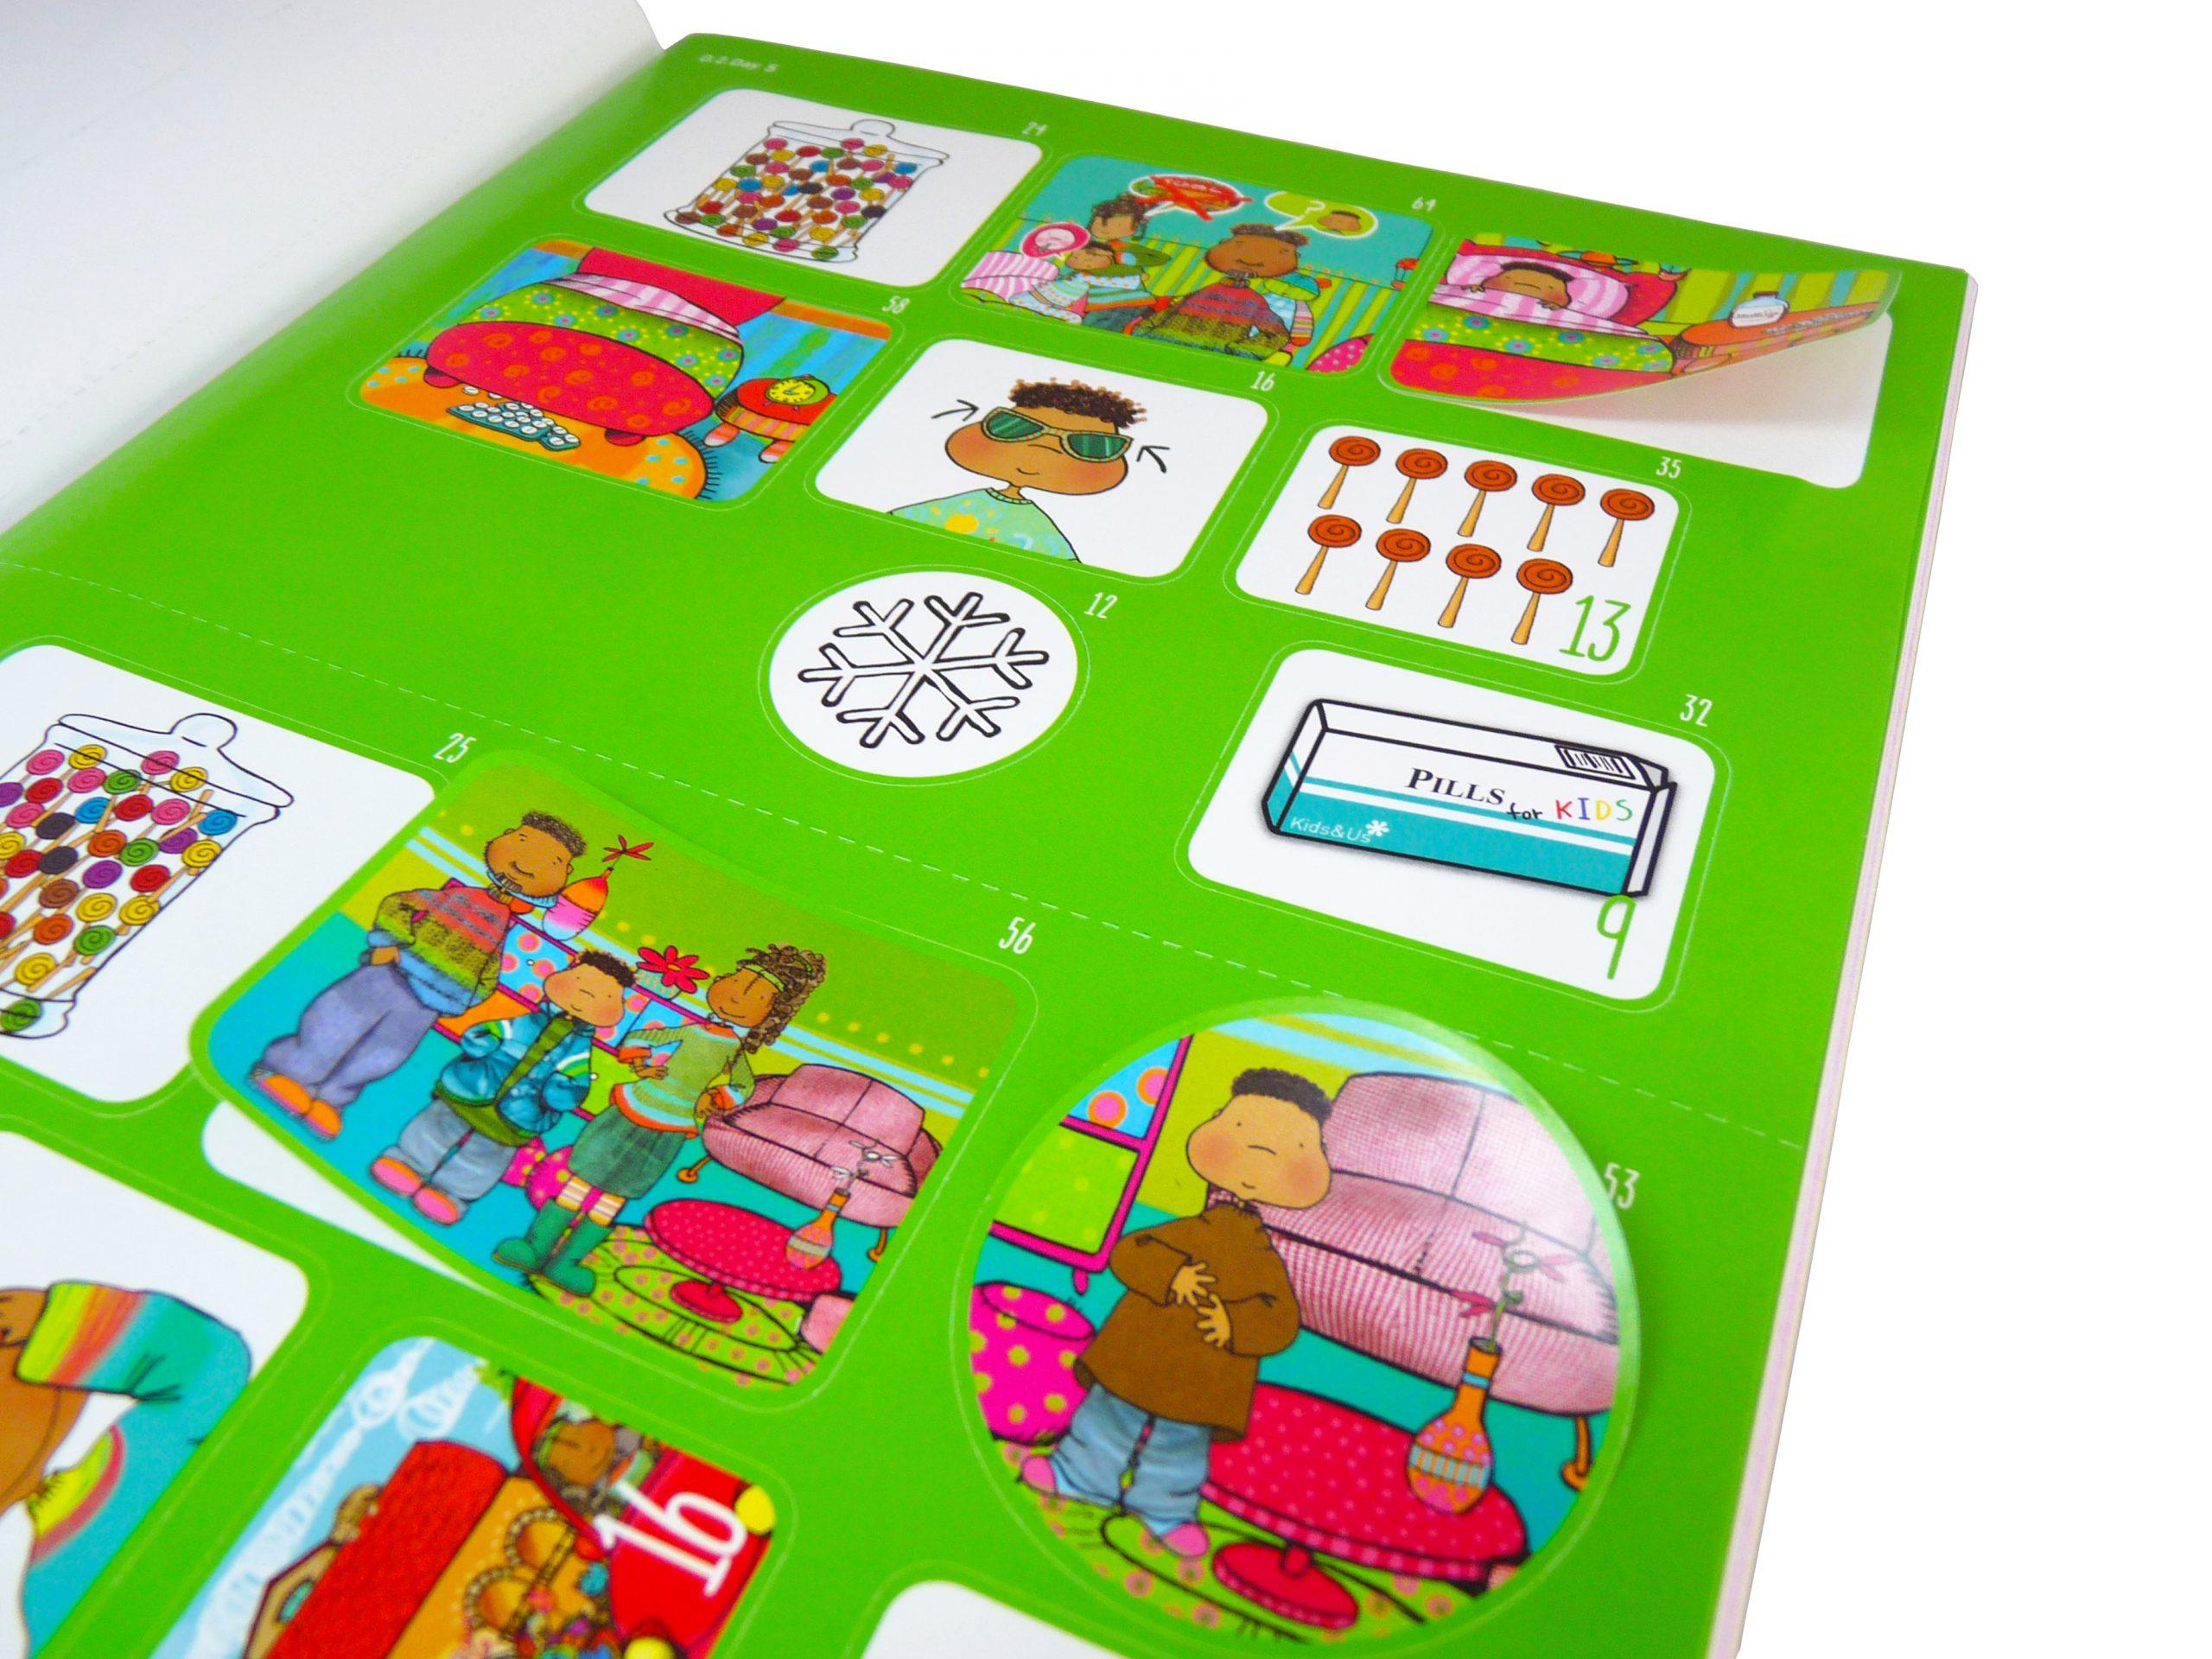 libro de adhesivos troquelados - Libro adhesivos 3